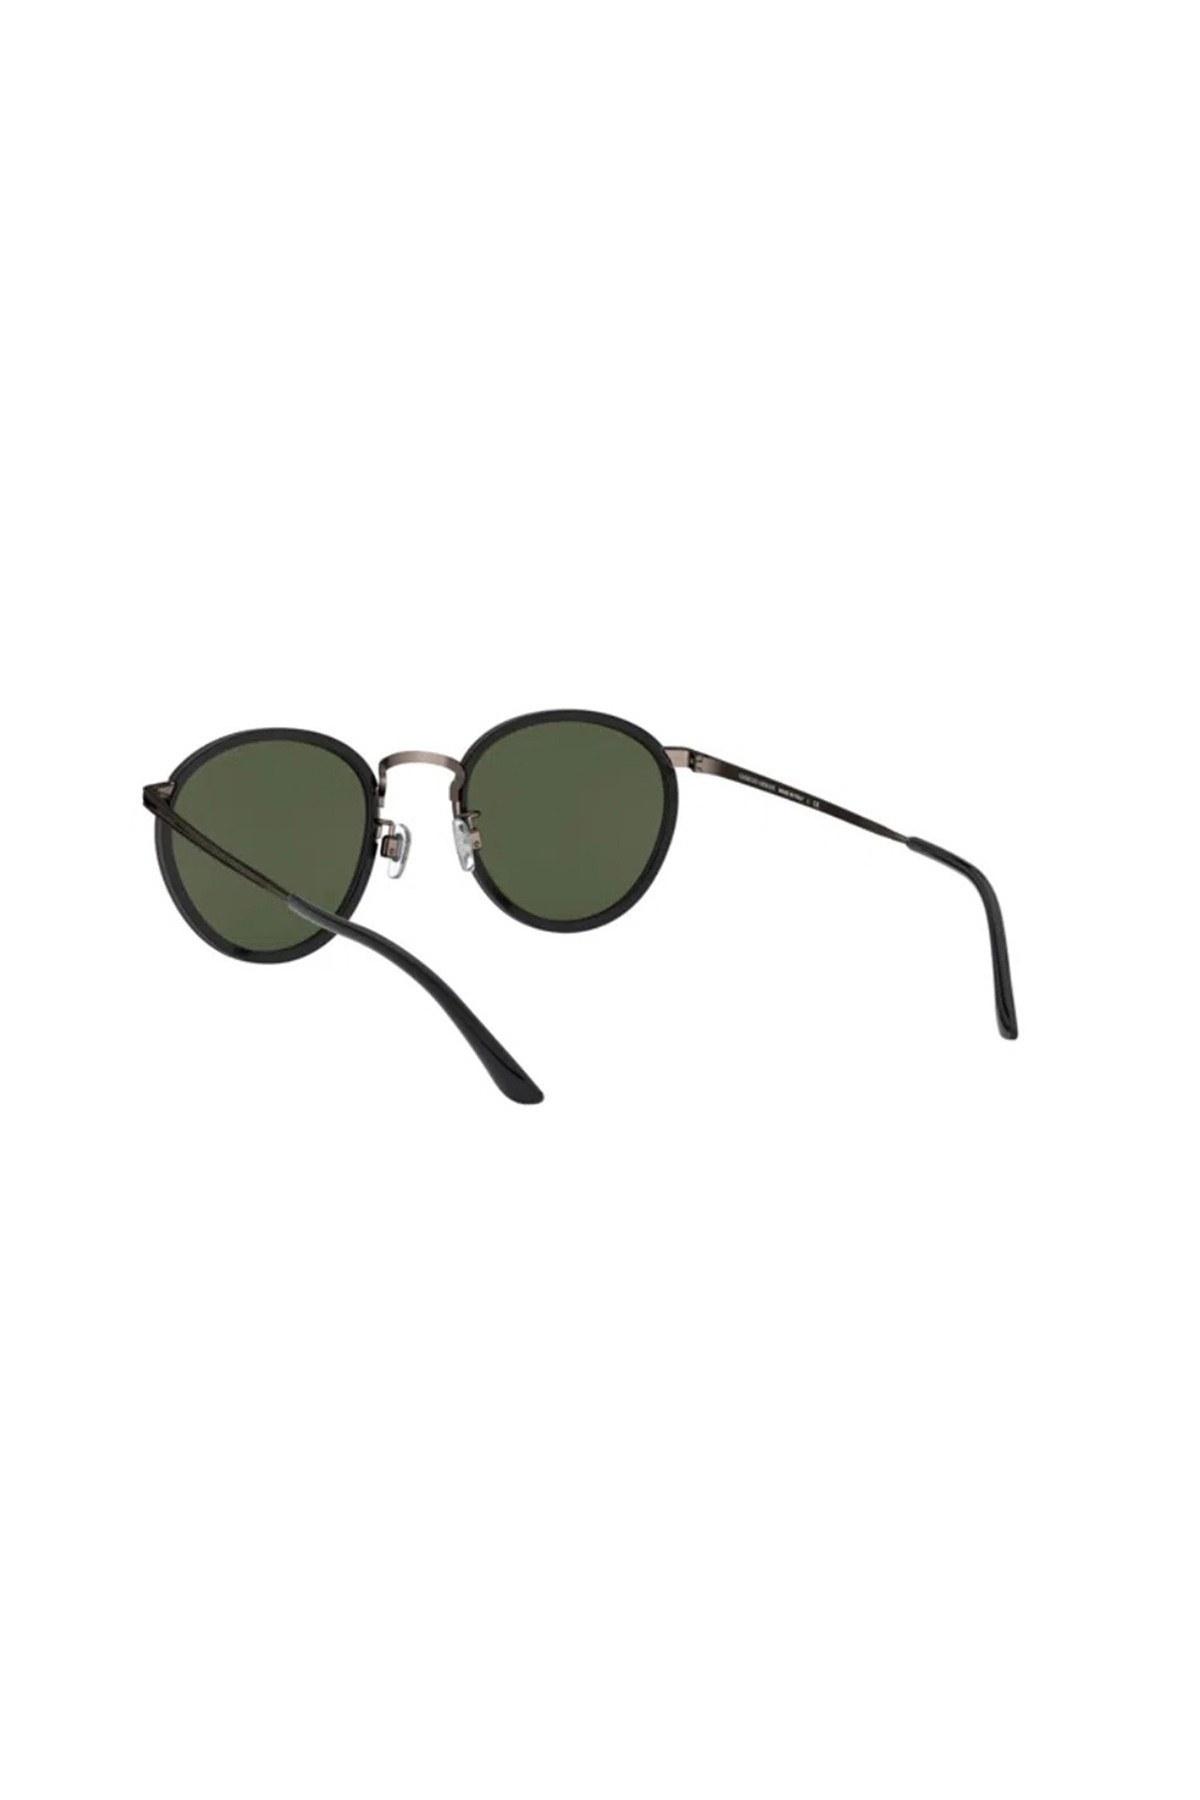 Giorgio Armani Erkek Gözlük 0AR101M 326031 50 SİYAH